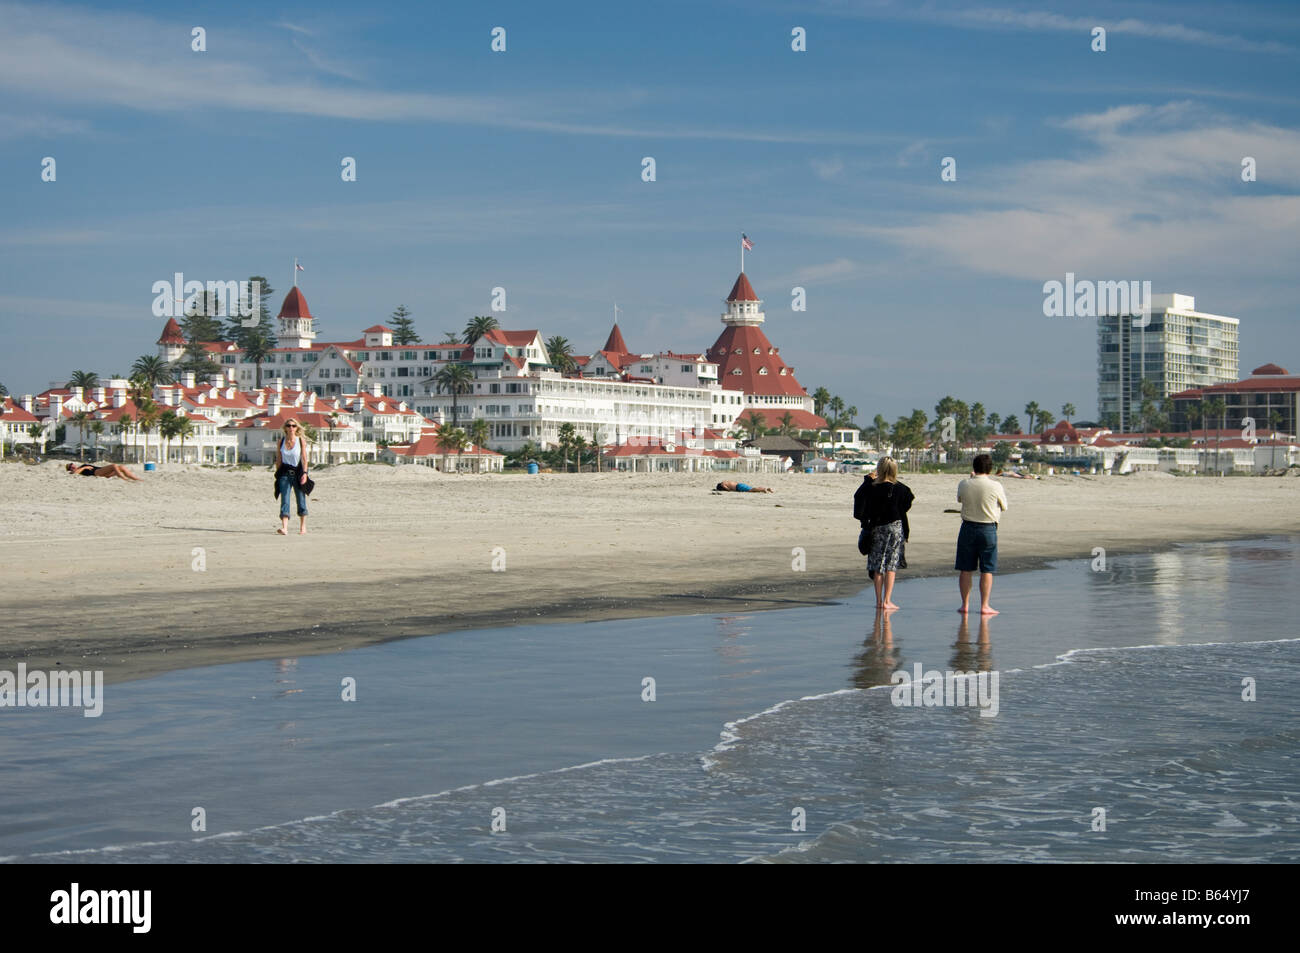 People walk on the beach in front of the Hotel del Coronado Coronado San Diego California no MRs Stock Photo